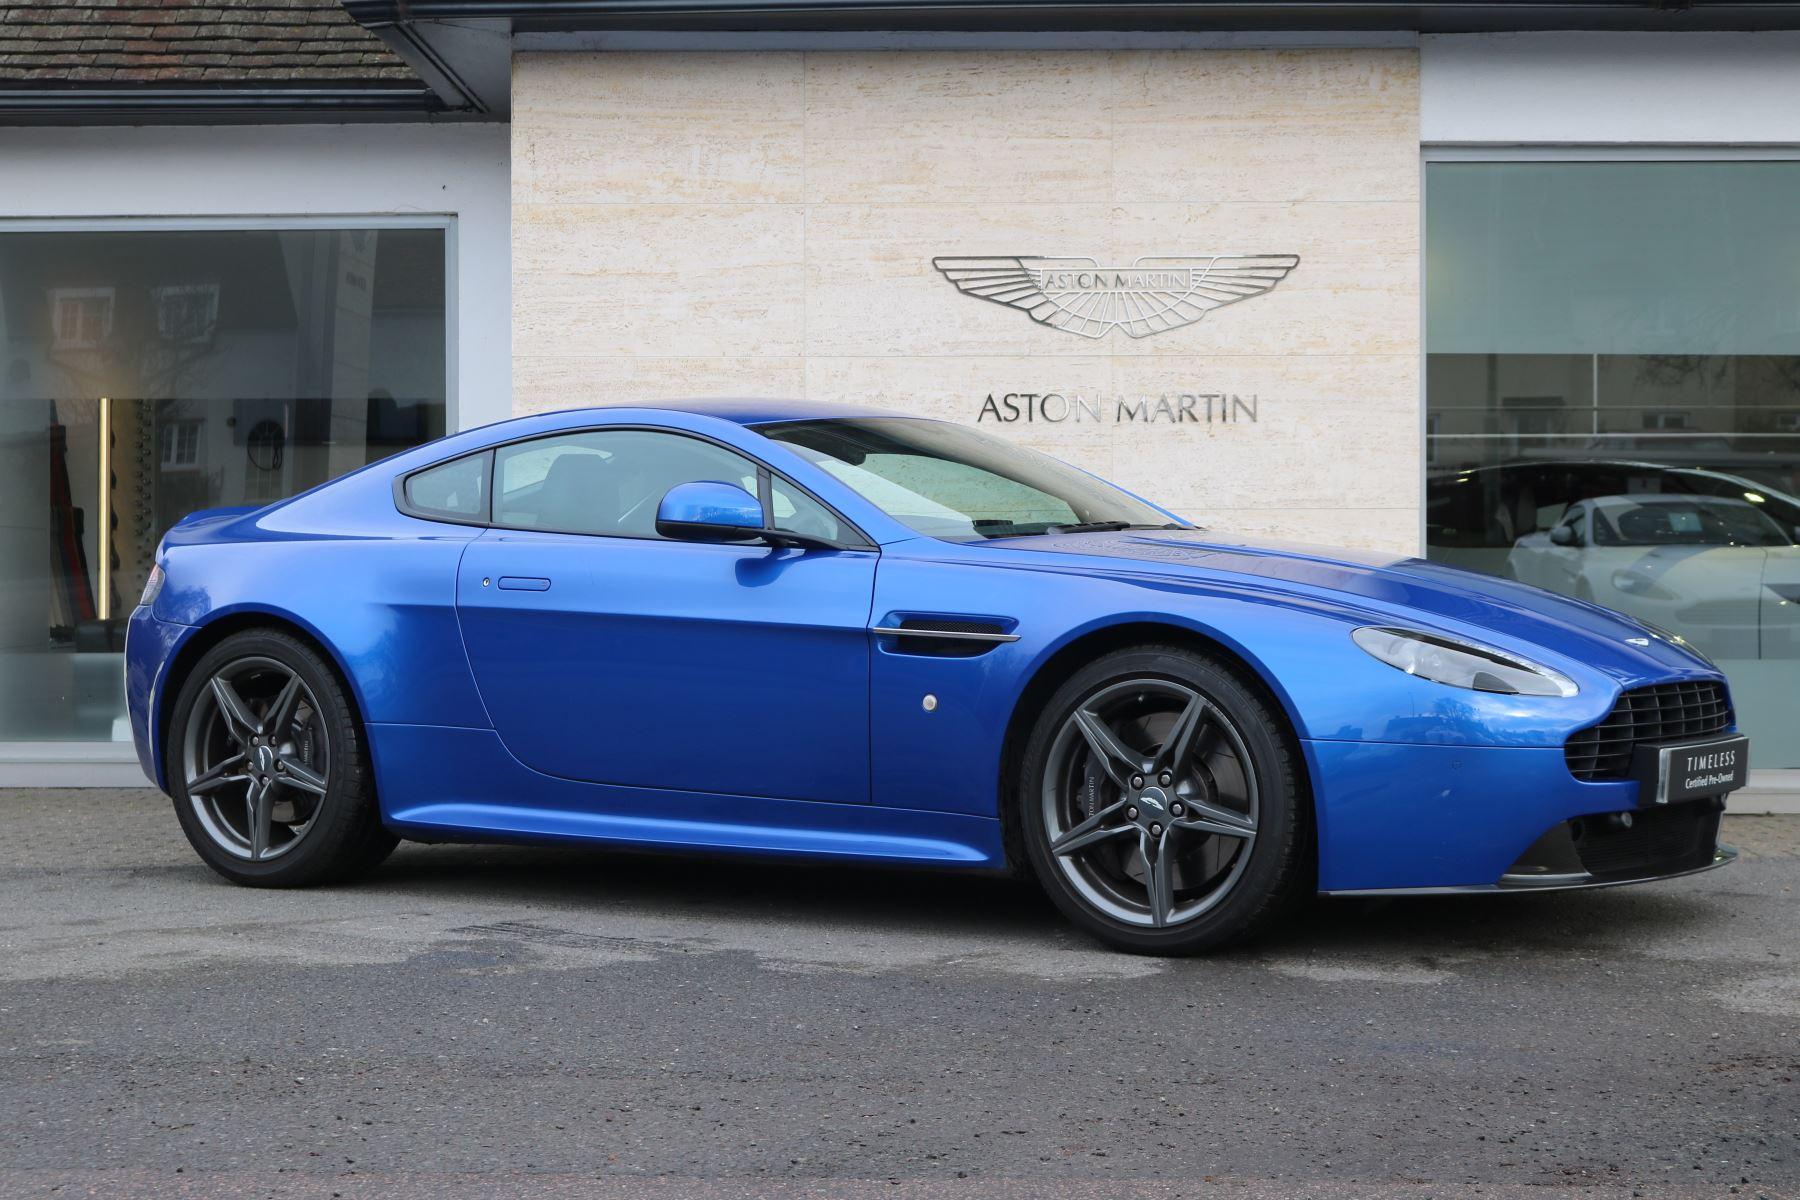 Aston Martin V8 Vantage S S 2dr Sportshift image 3